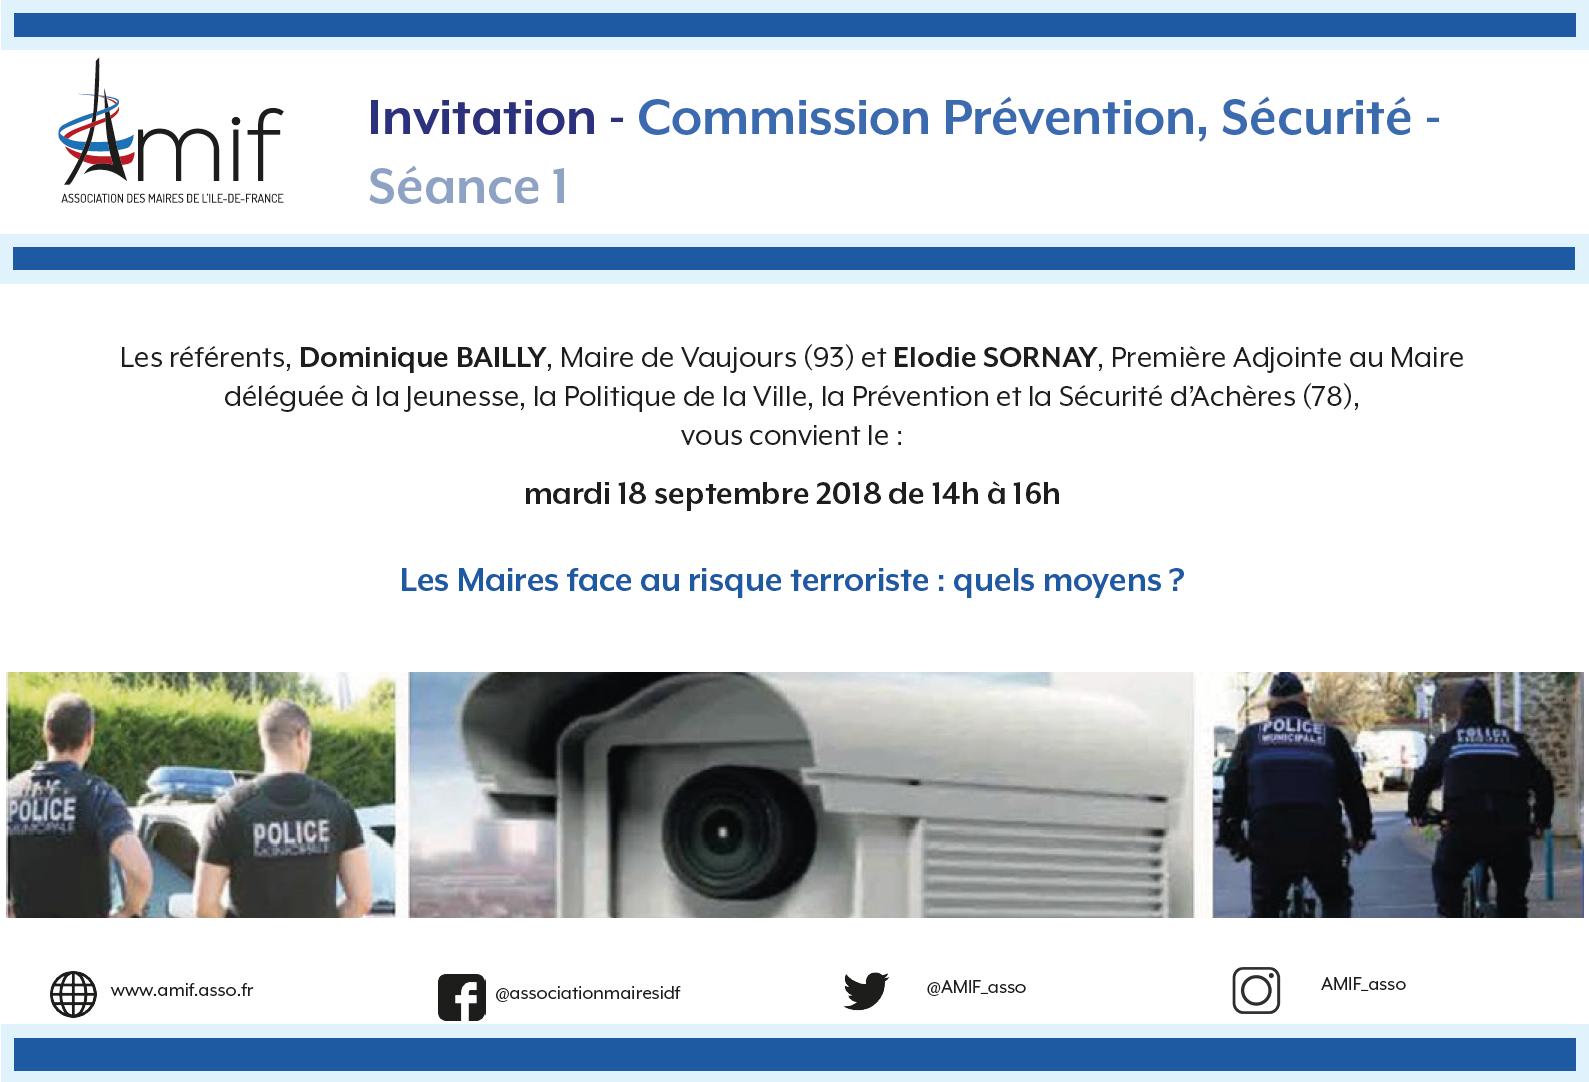 CommissionPreventionSecuriteSeance118septembre2018v2